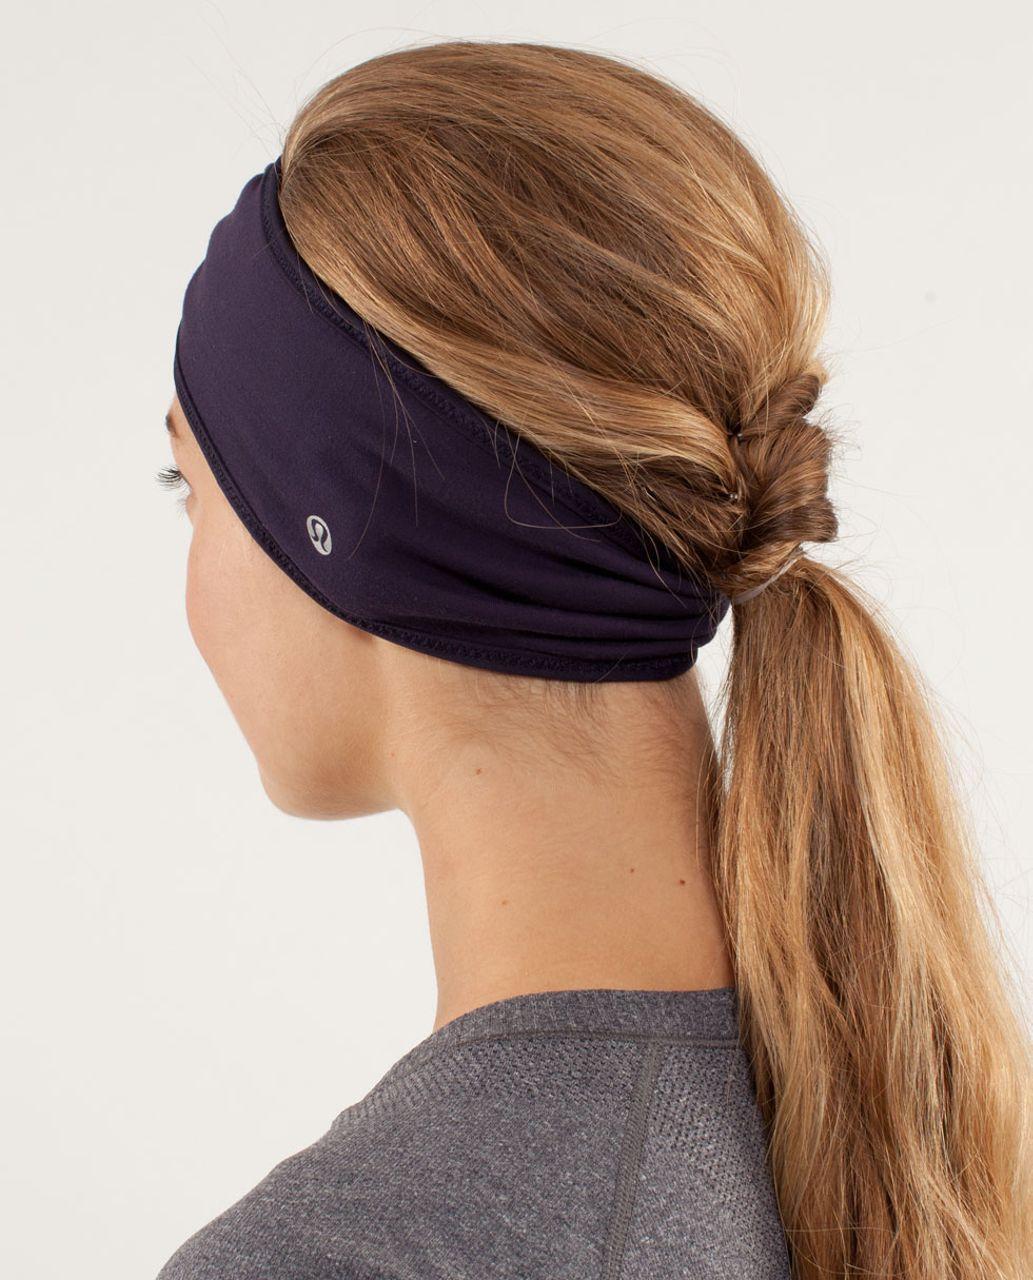 Lululemon Brisk Run Headband - Raspberry Glo Light / Black Swan